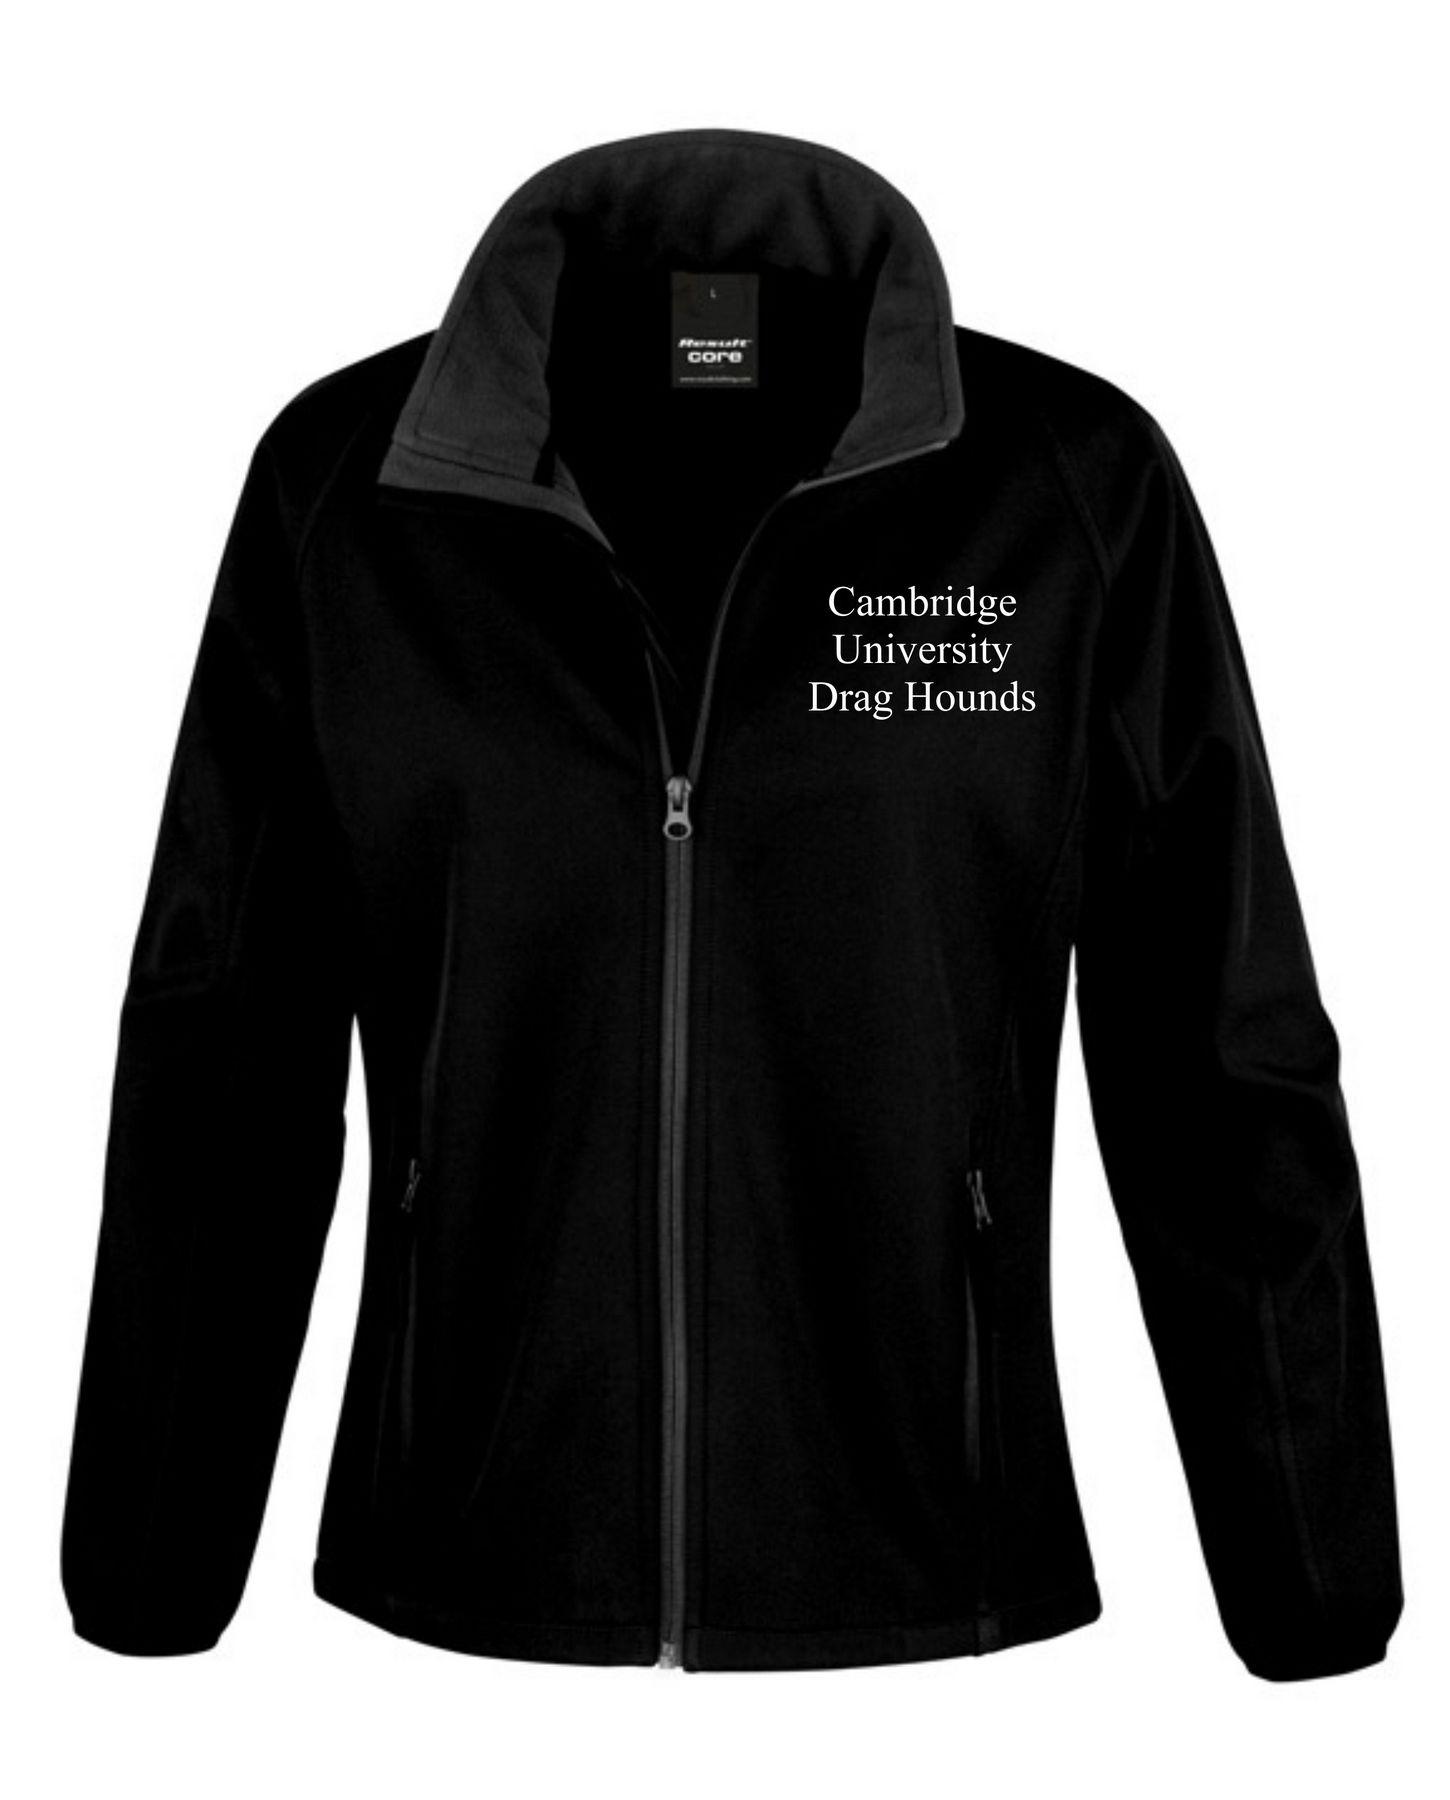 CUDH – Women's Softshell Jacket